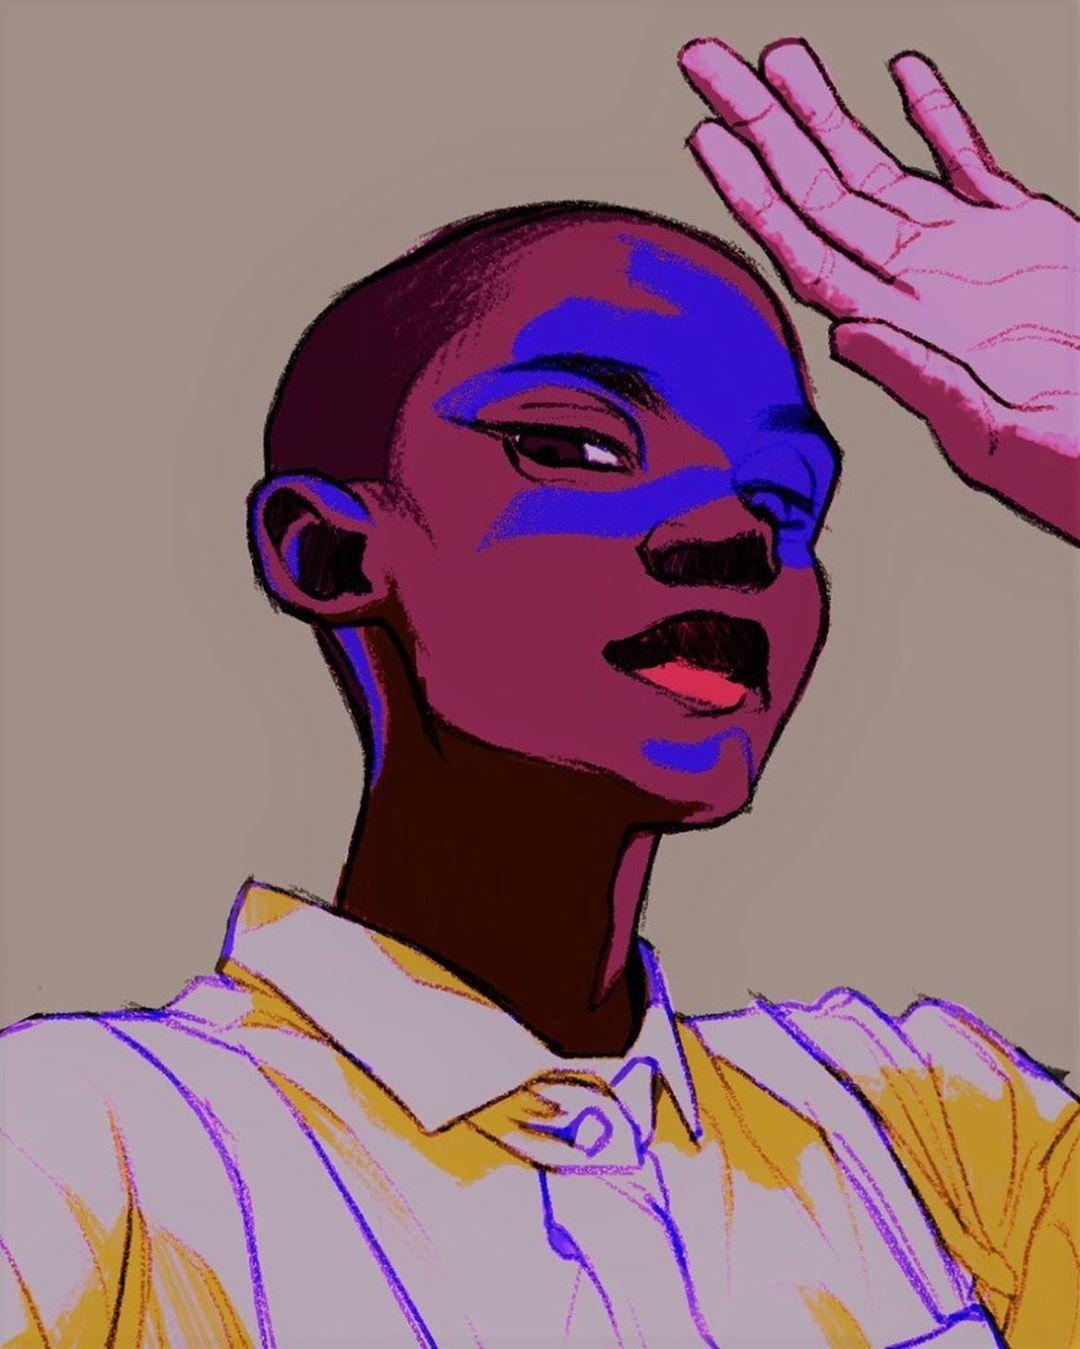 On Instagram I Feel Like I M Going Thru A Neon Phase Digital Art Drawing Illustration Digita Emotional Art Digital Art Illustration Drawings